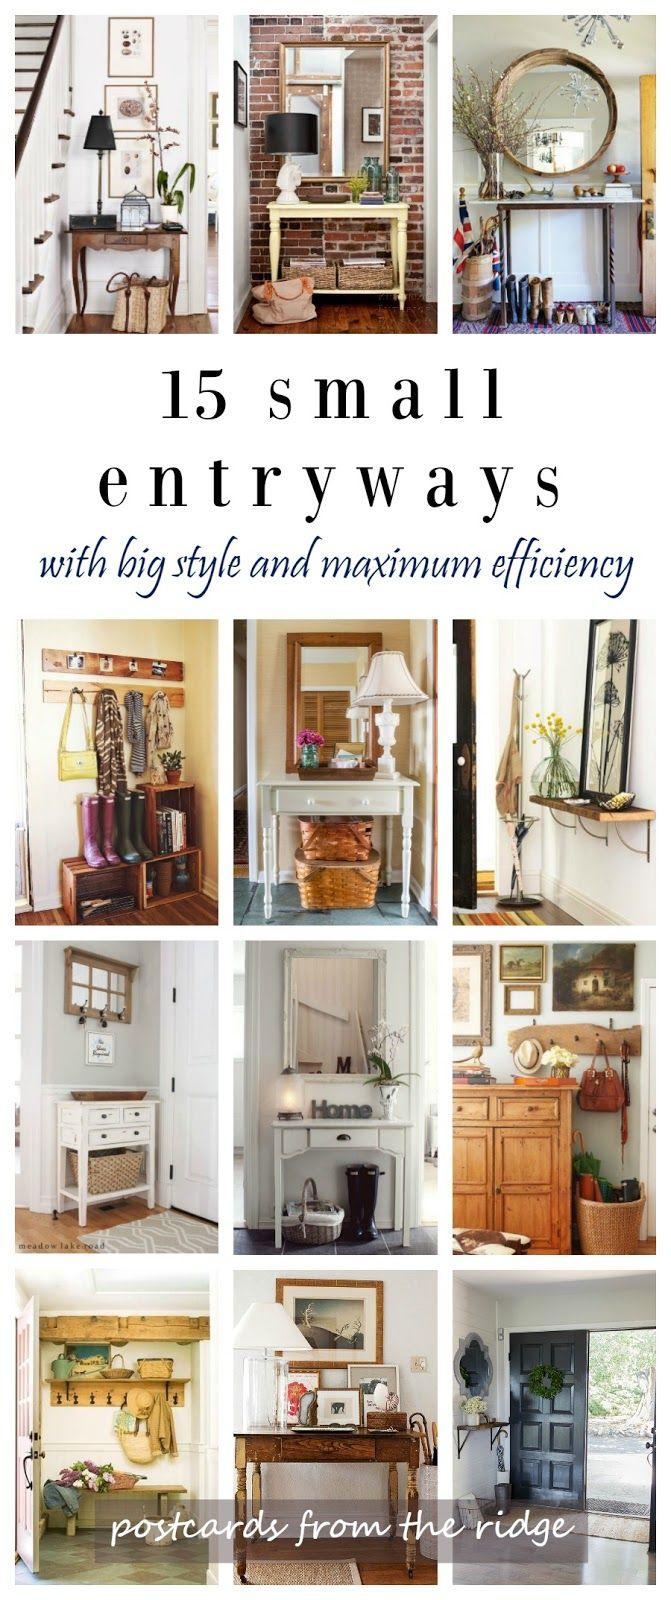 15 Fresh Ideas for Small Entryways | DIY Home Decor ...